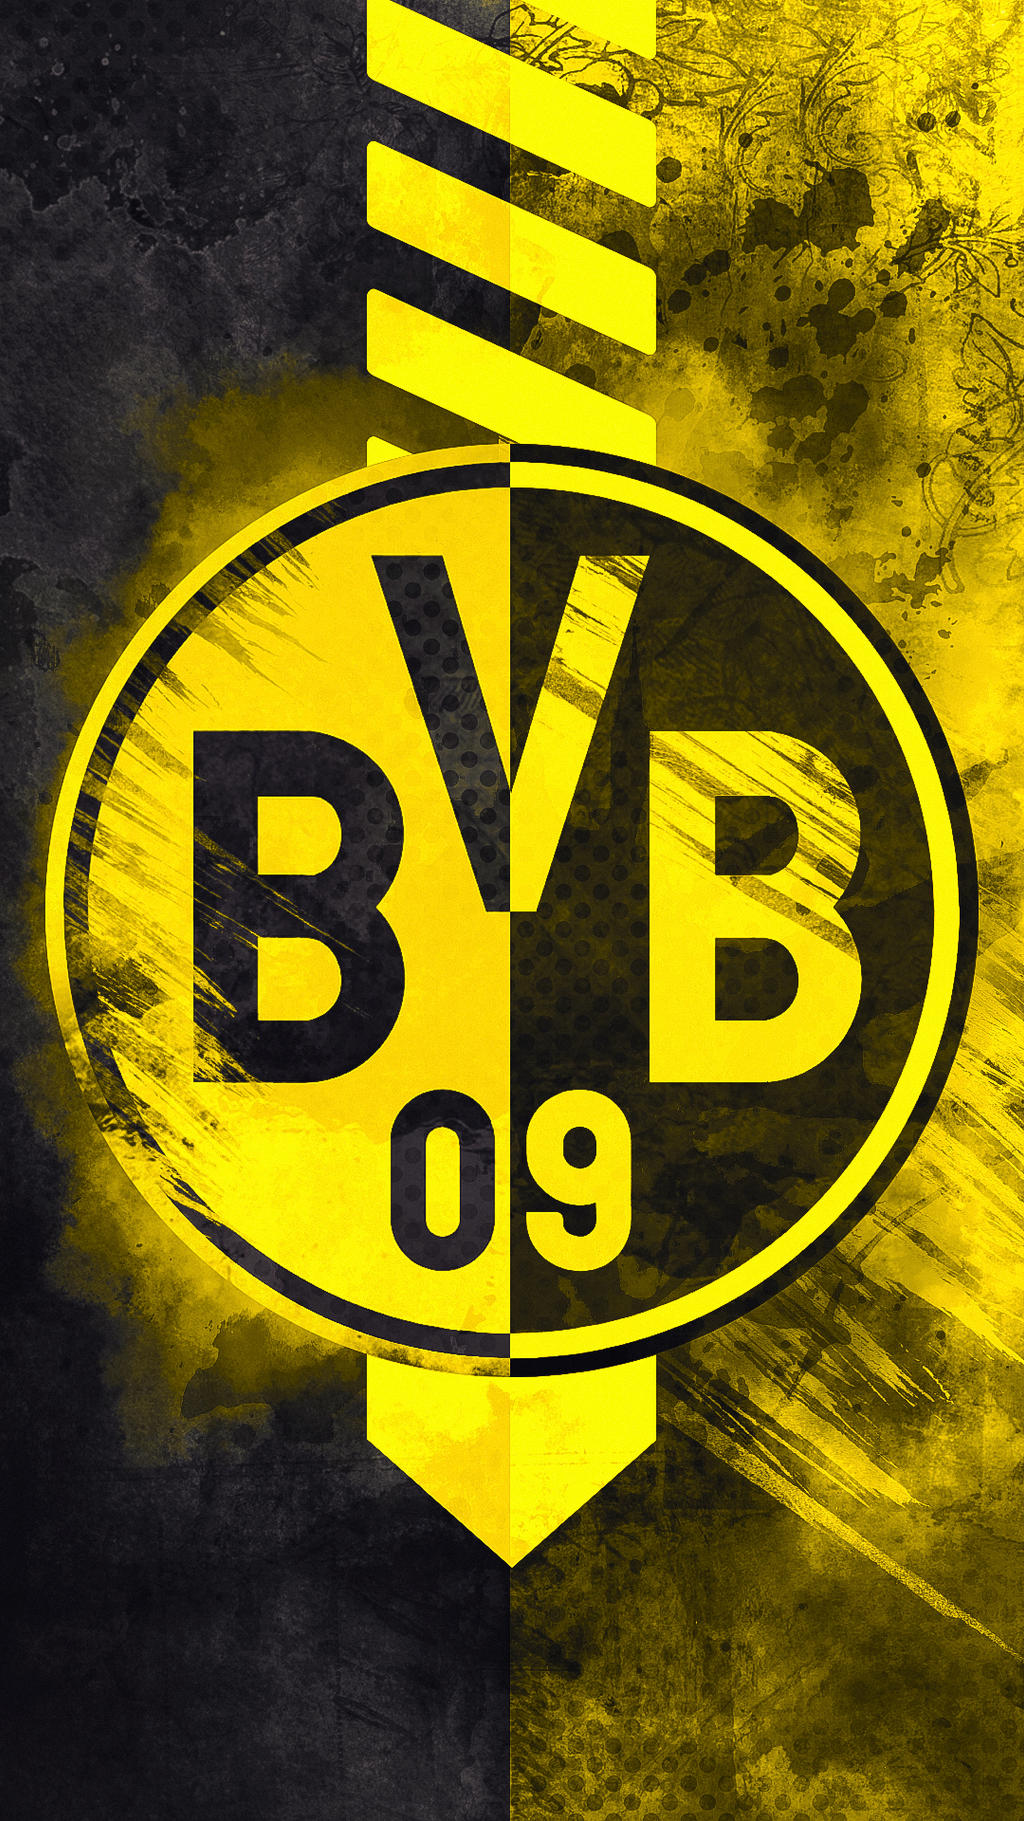 Borussia Dortmund - HD Logo Wallpaper